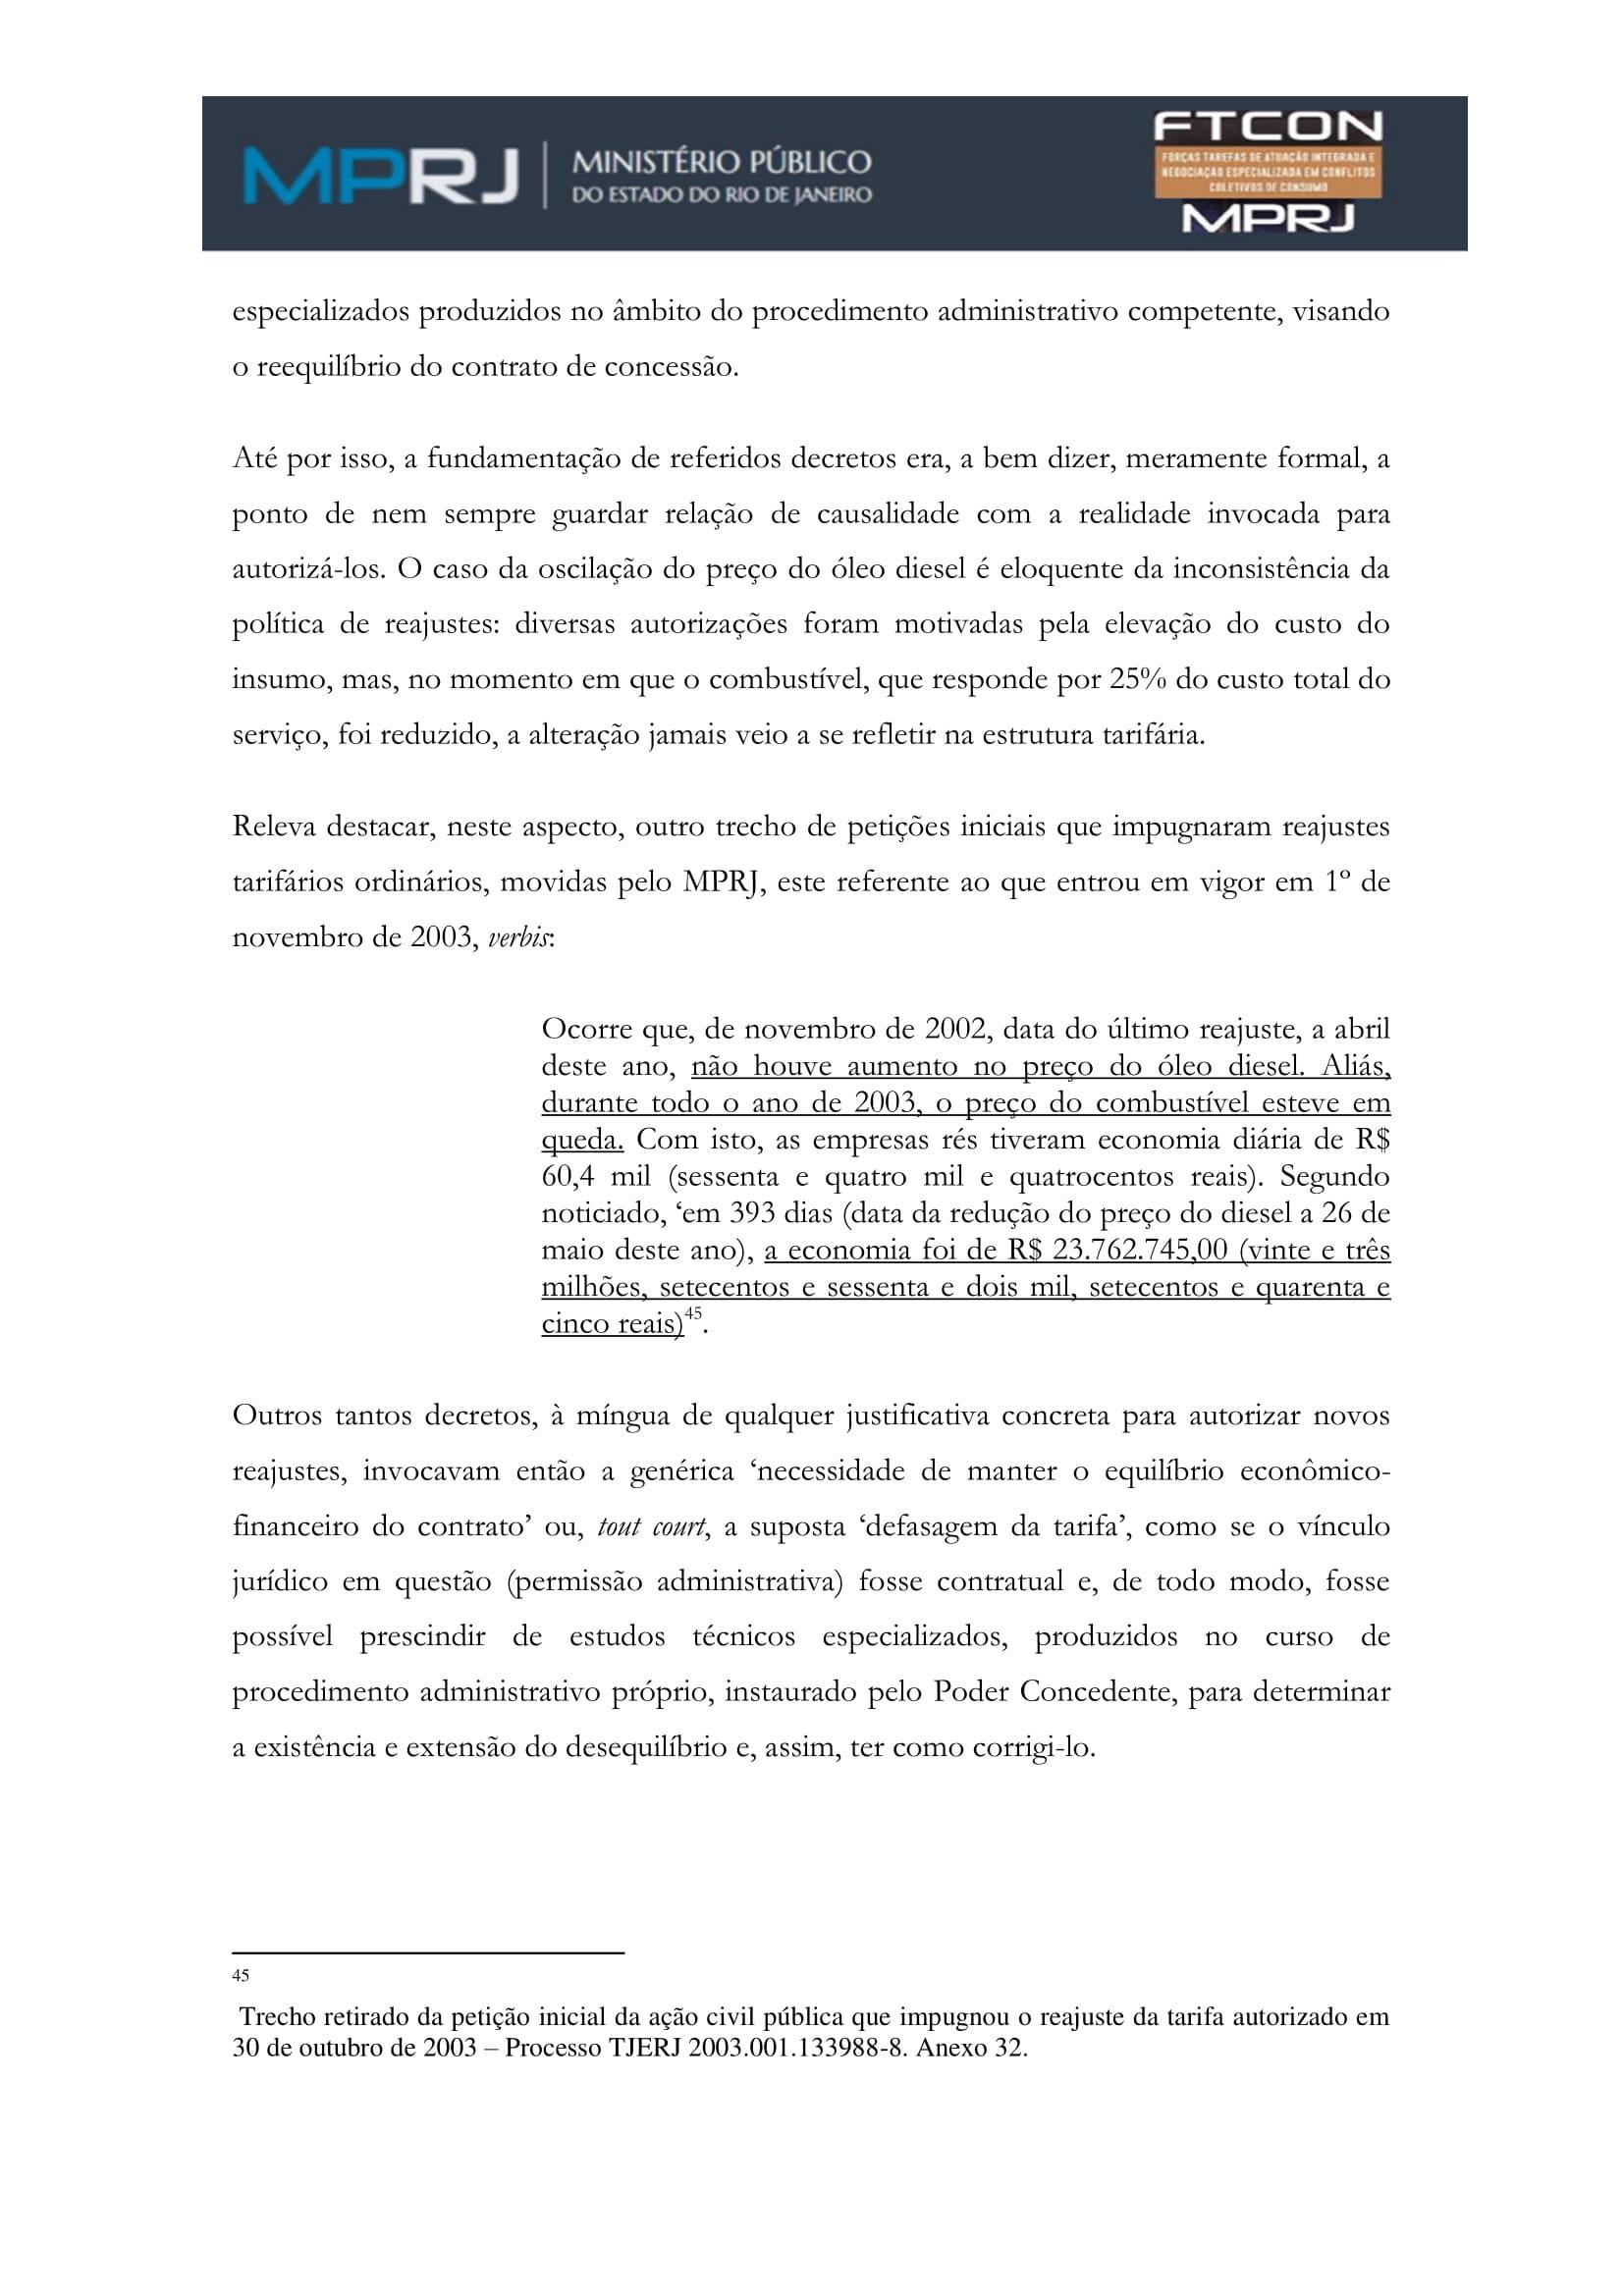 acp_caducidade_onibus_dr_rt-060